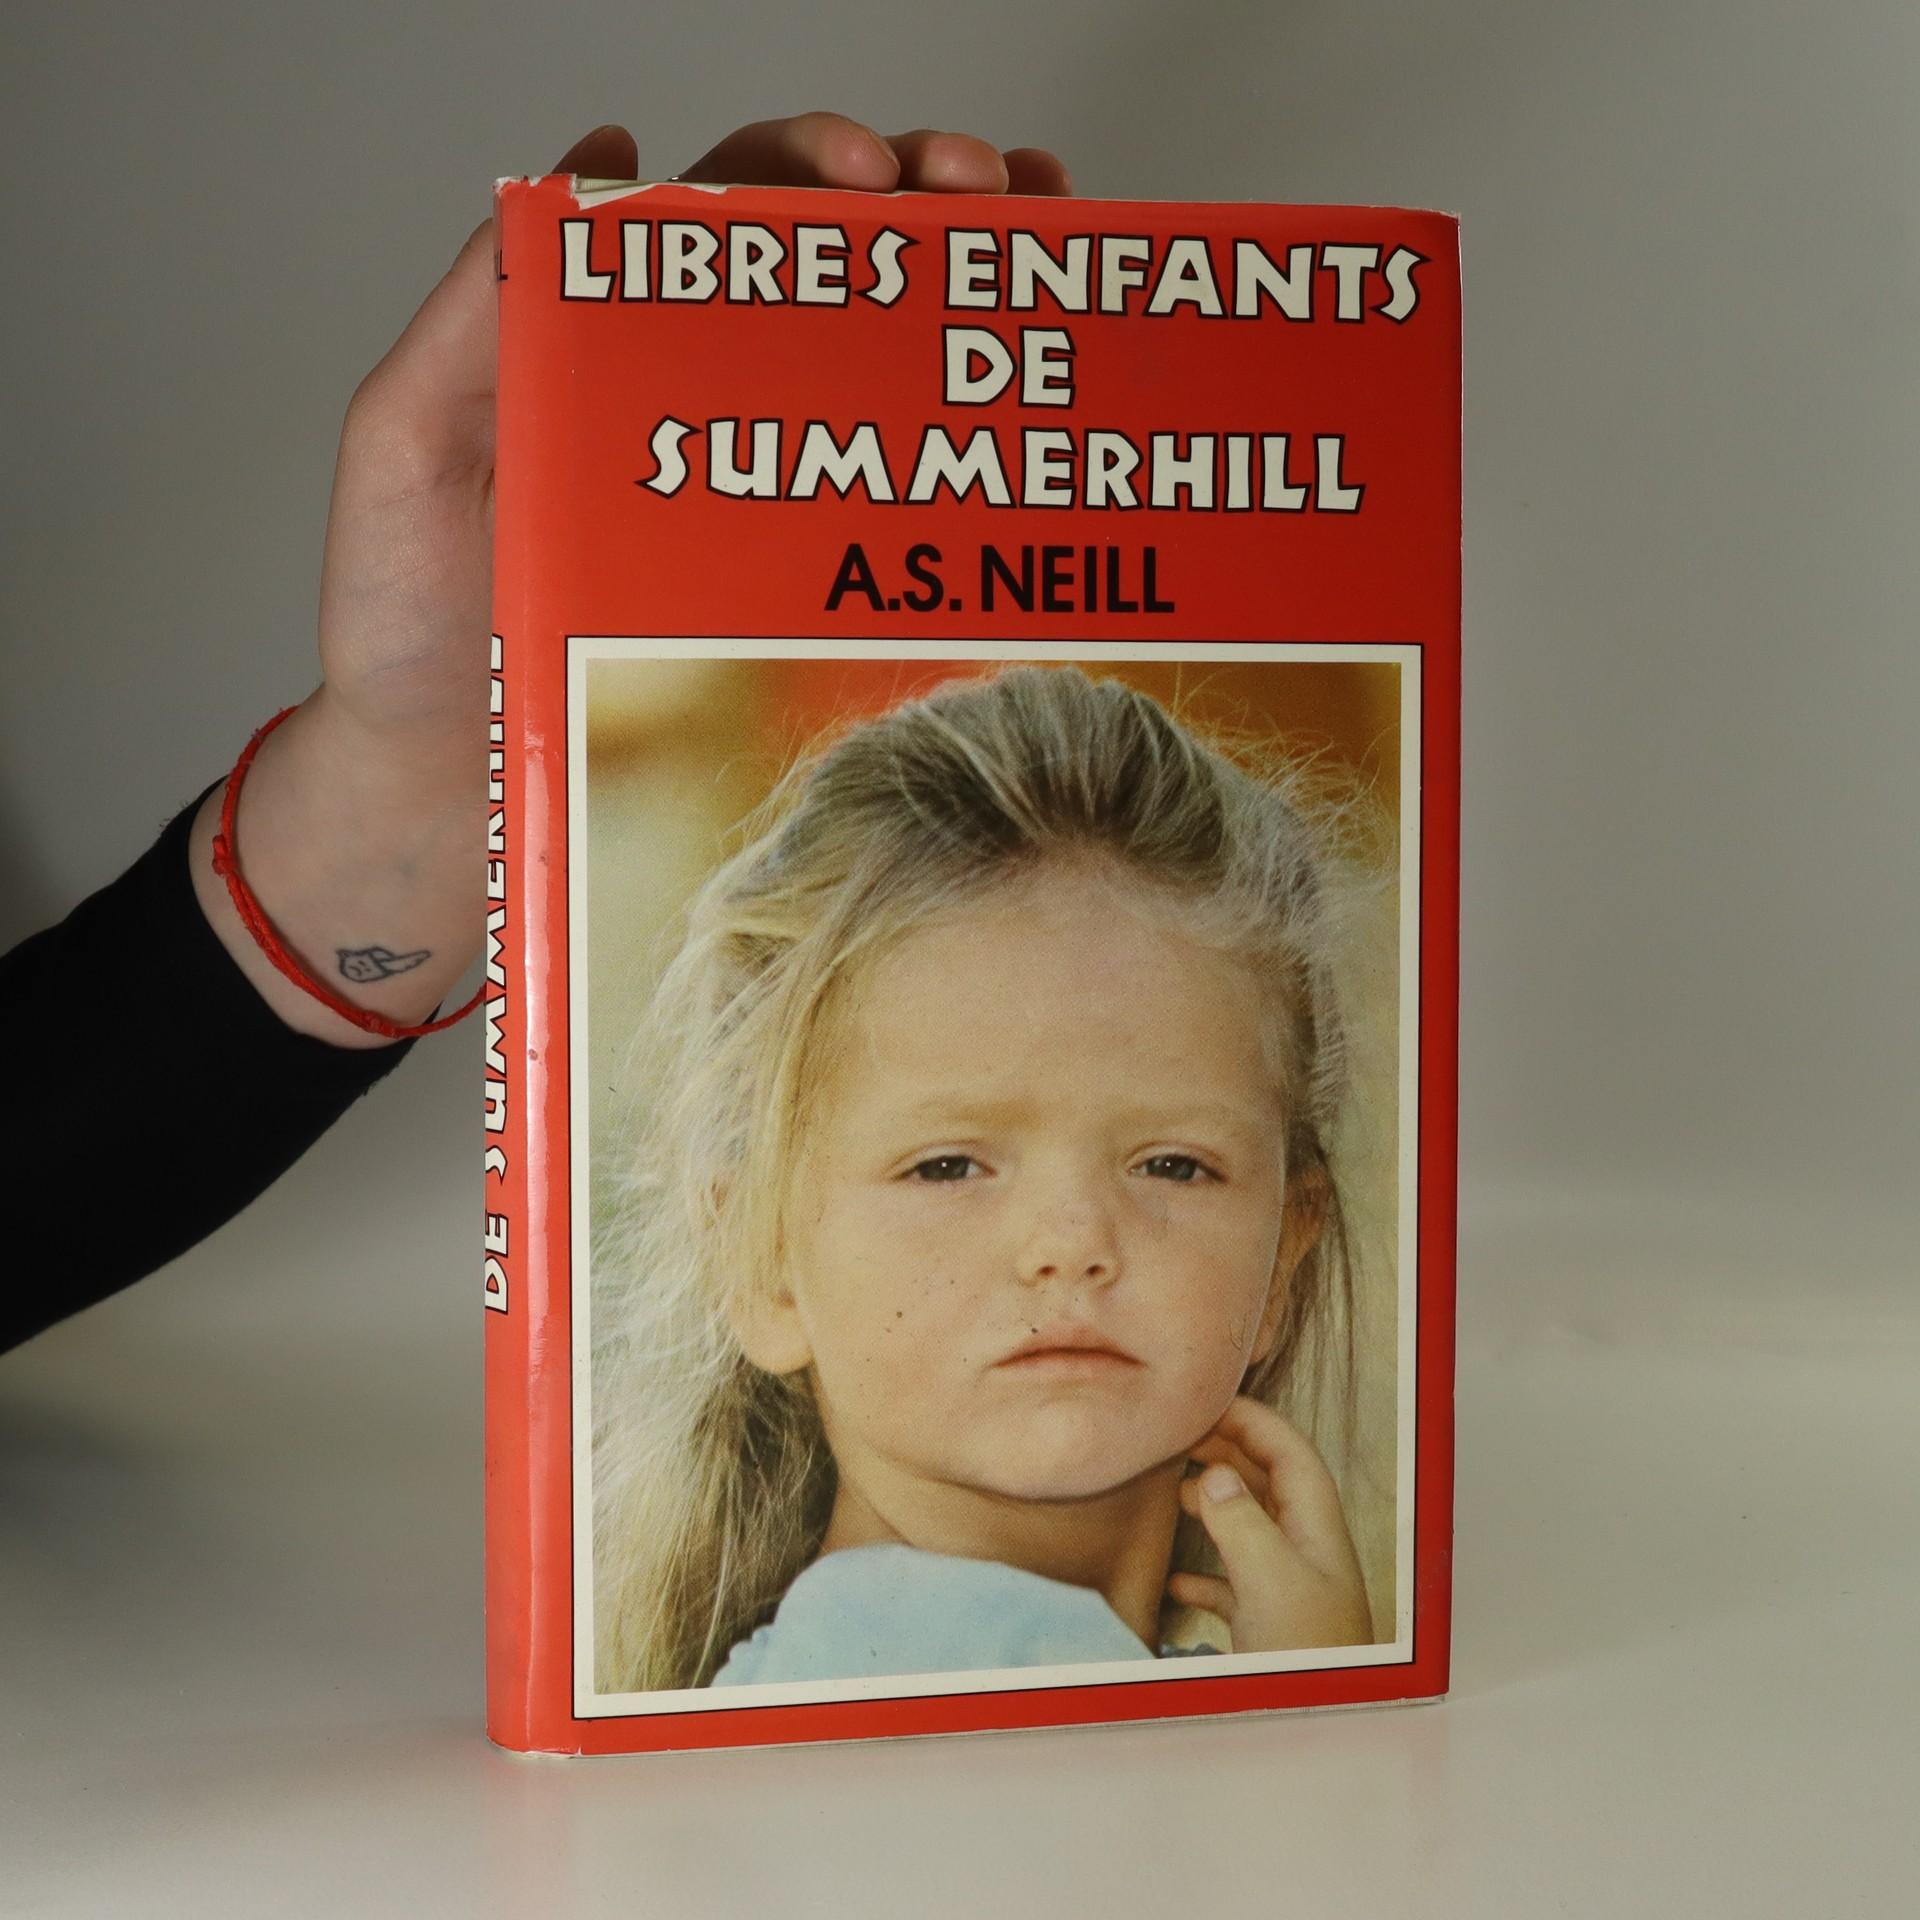 antikvární kniha Libres enfants de Summerhill, neuveden